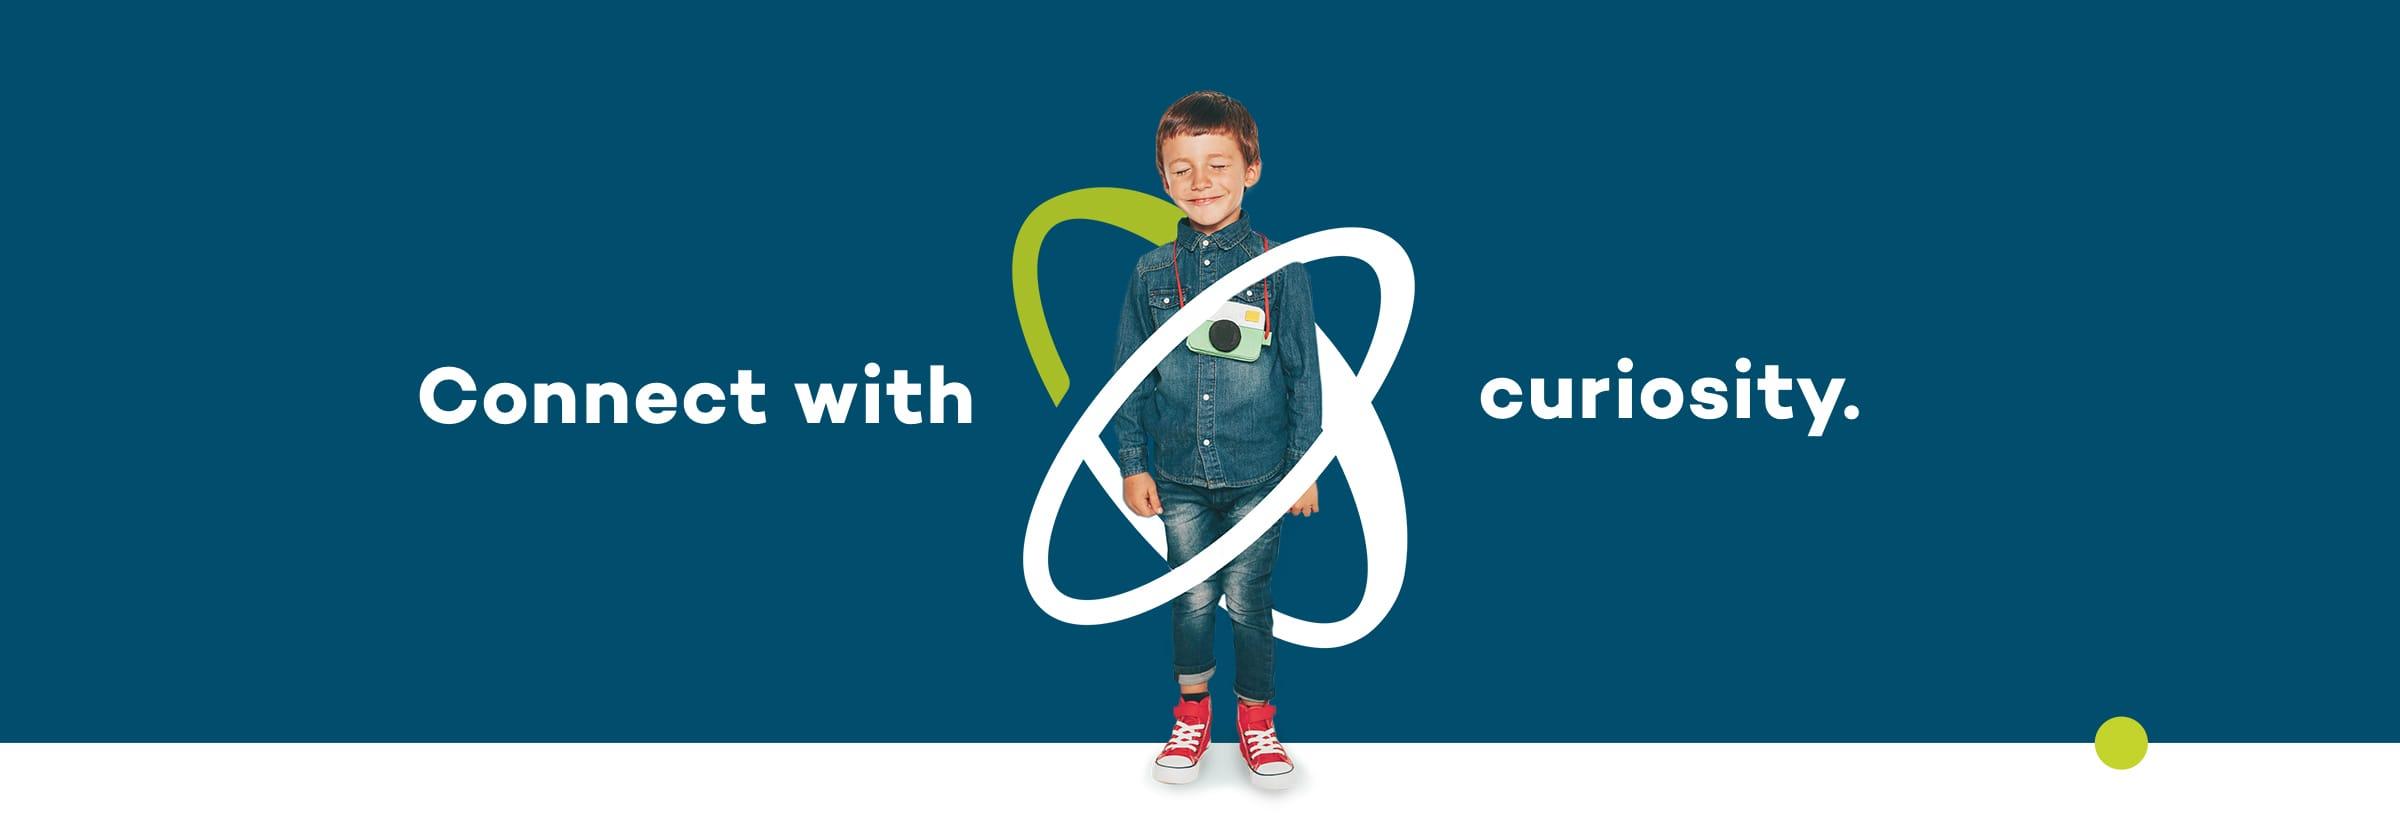 Saint Louis Science Center Branding Tagline